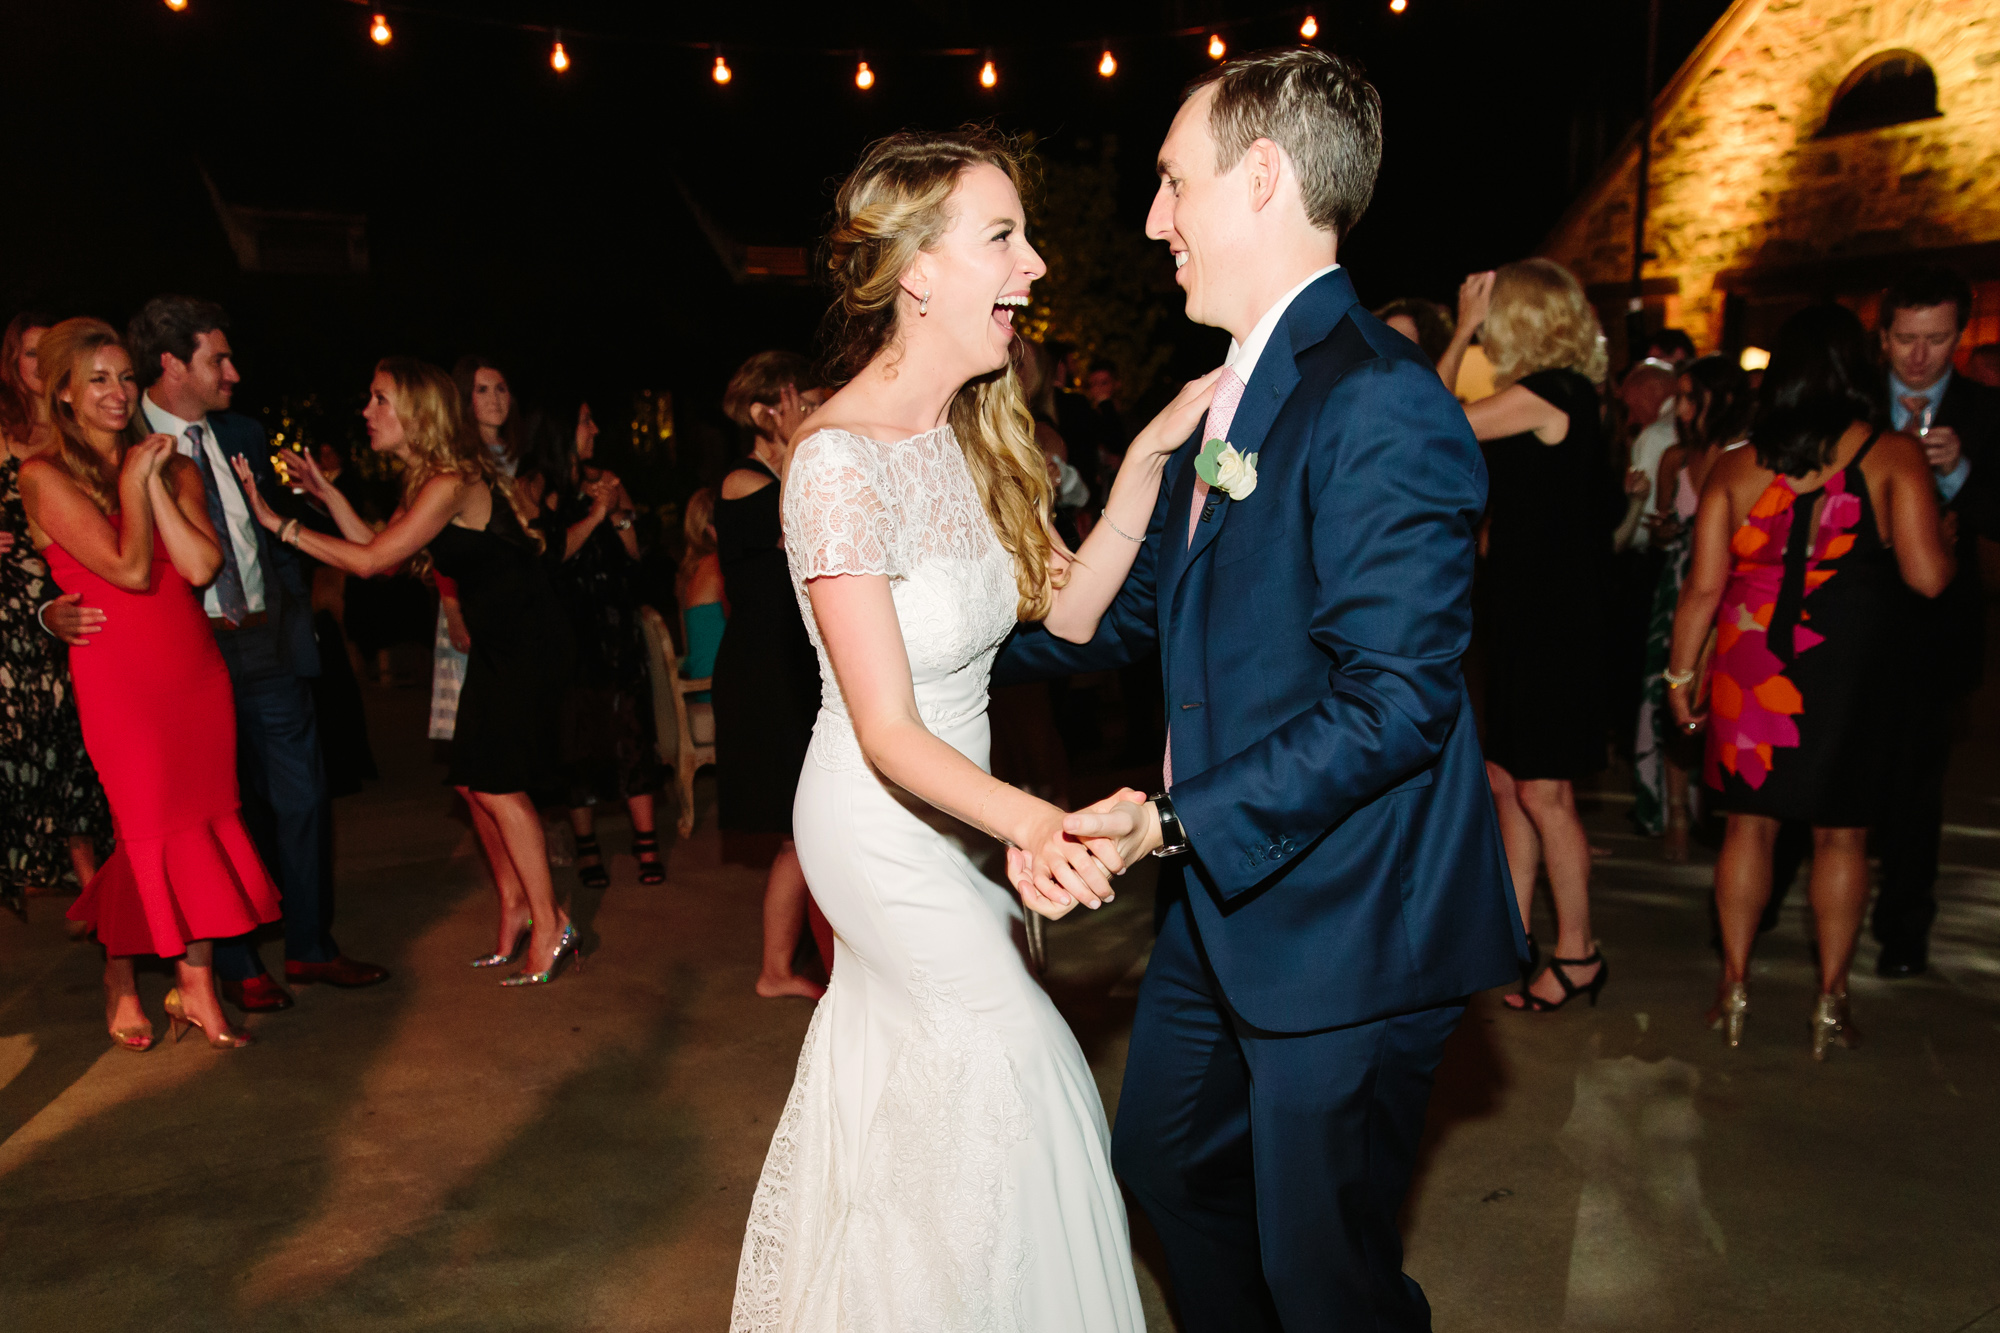 65_Jessica_Ted_Blue_Hill_Stone_Barns_Wedding_Pocantico_NY_Tanya_Salazar_Photography_193.jpg